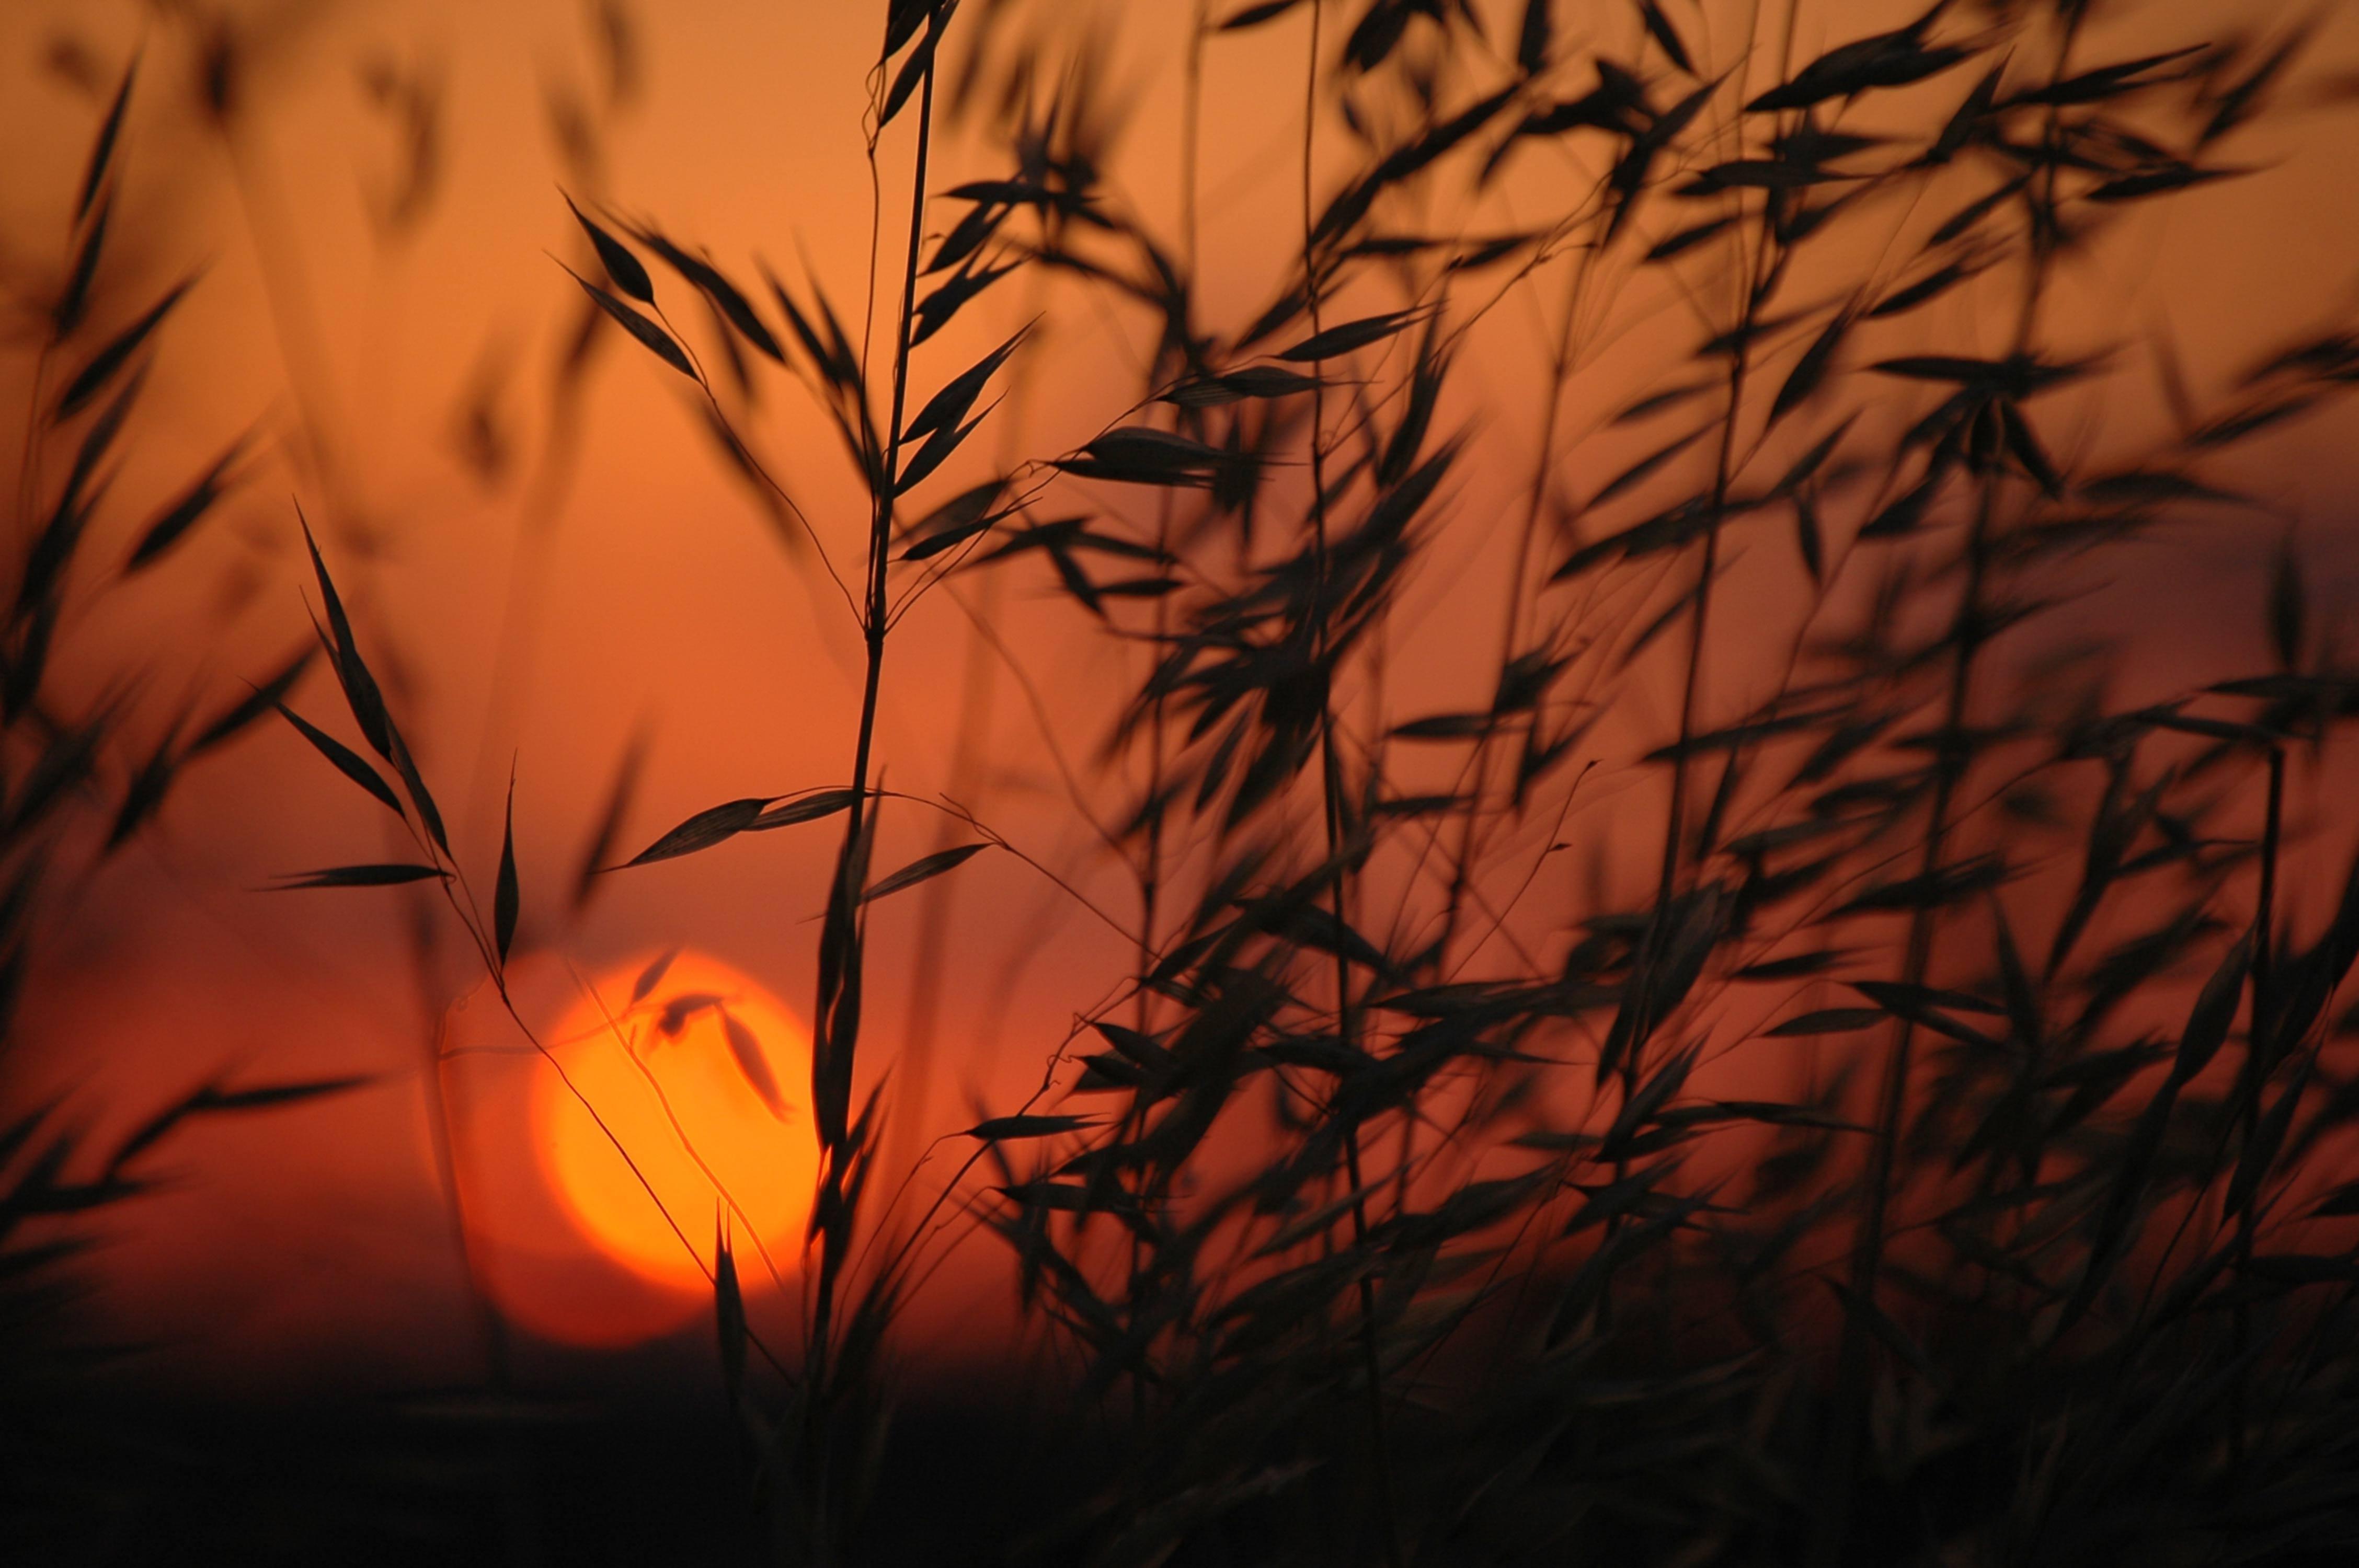 Sunset Through the Corn